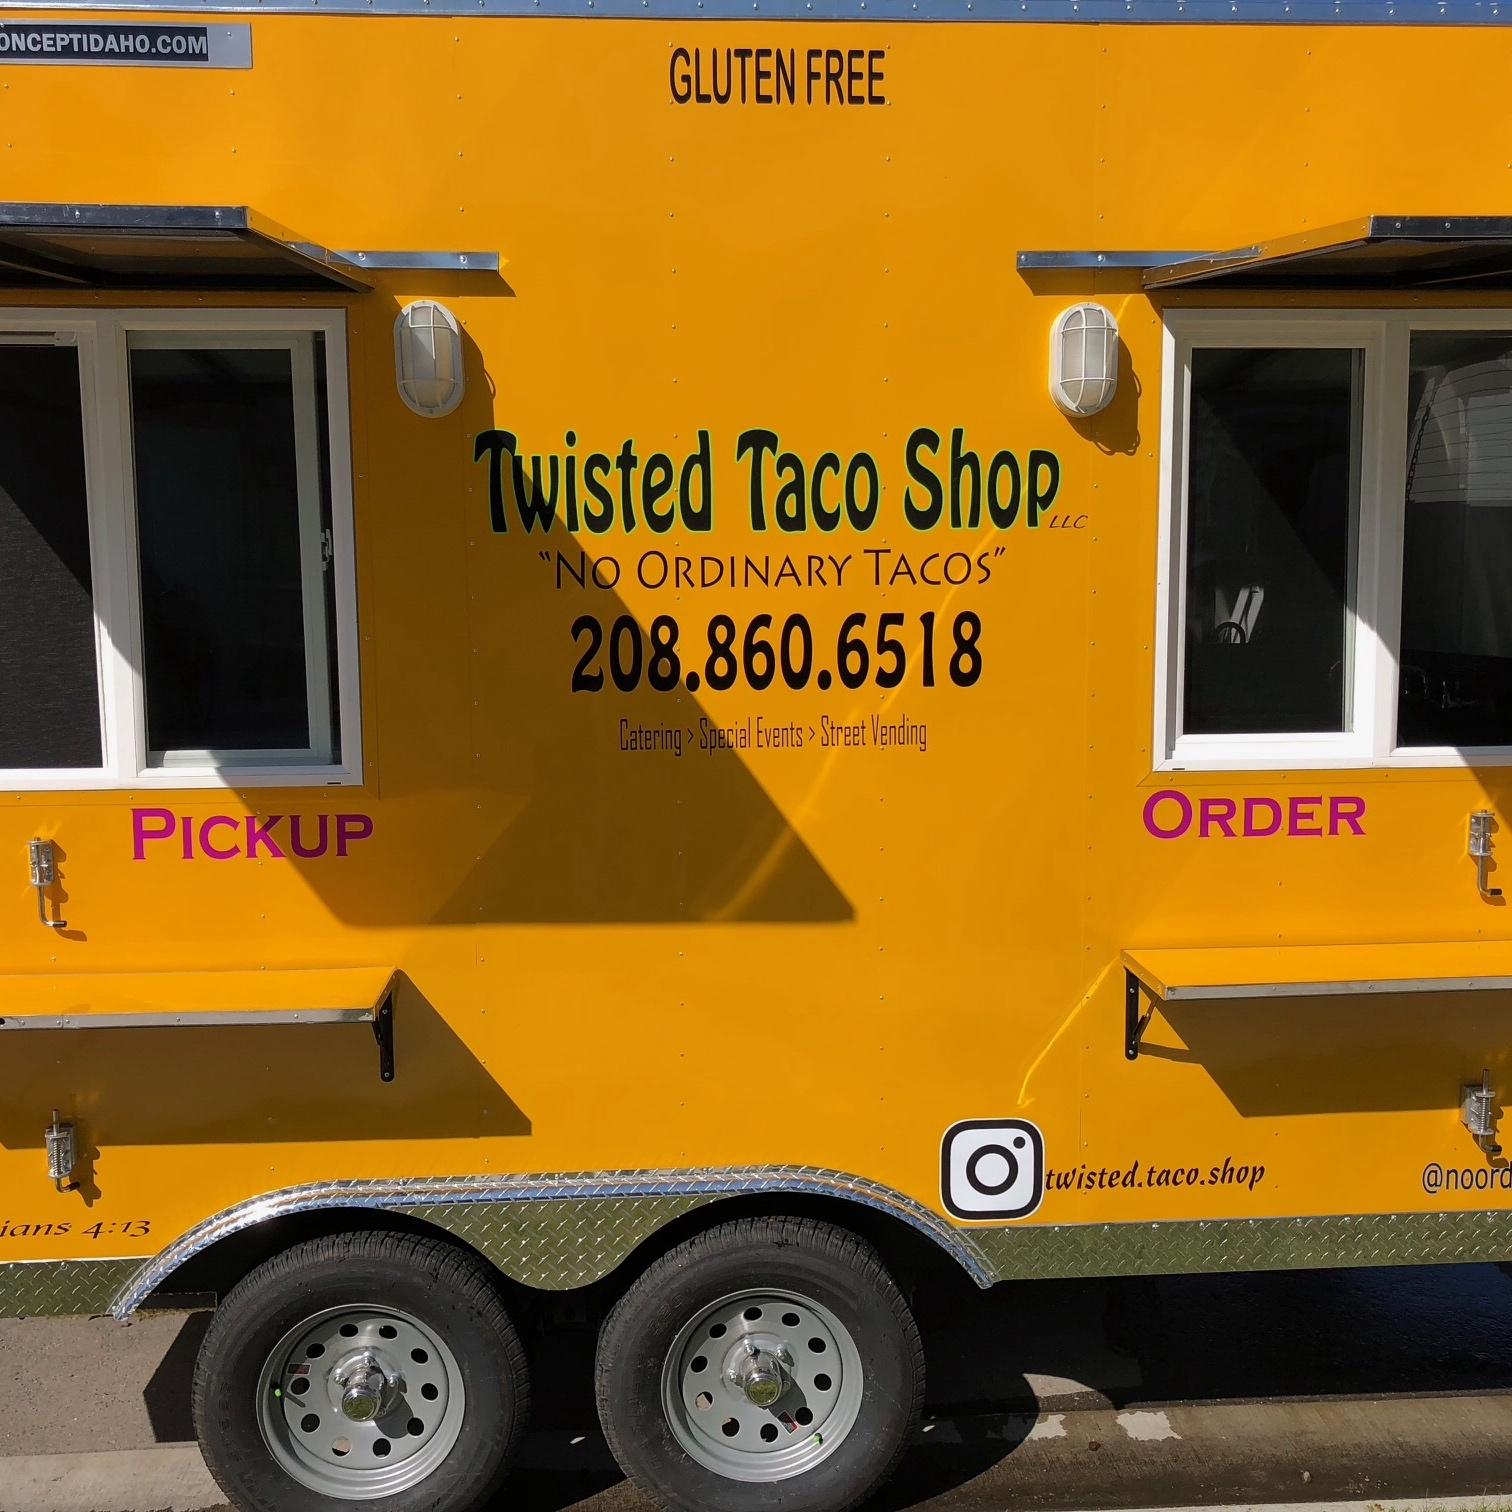 Twisted Taco Shop food truck profile image